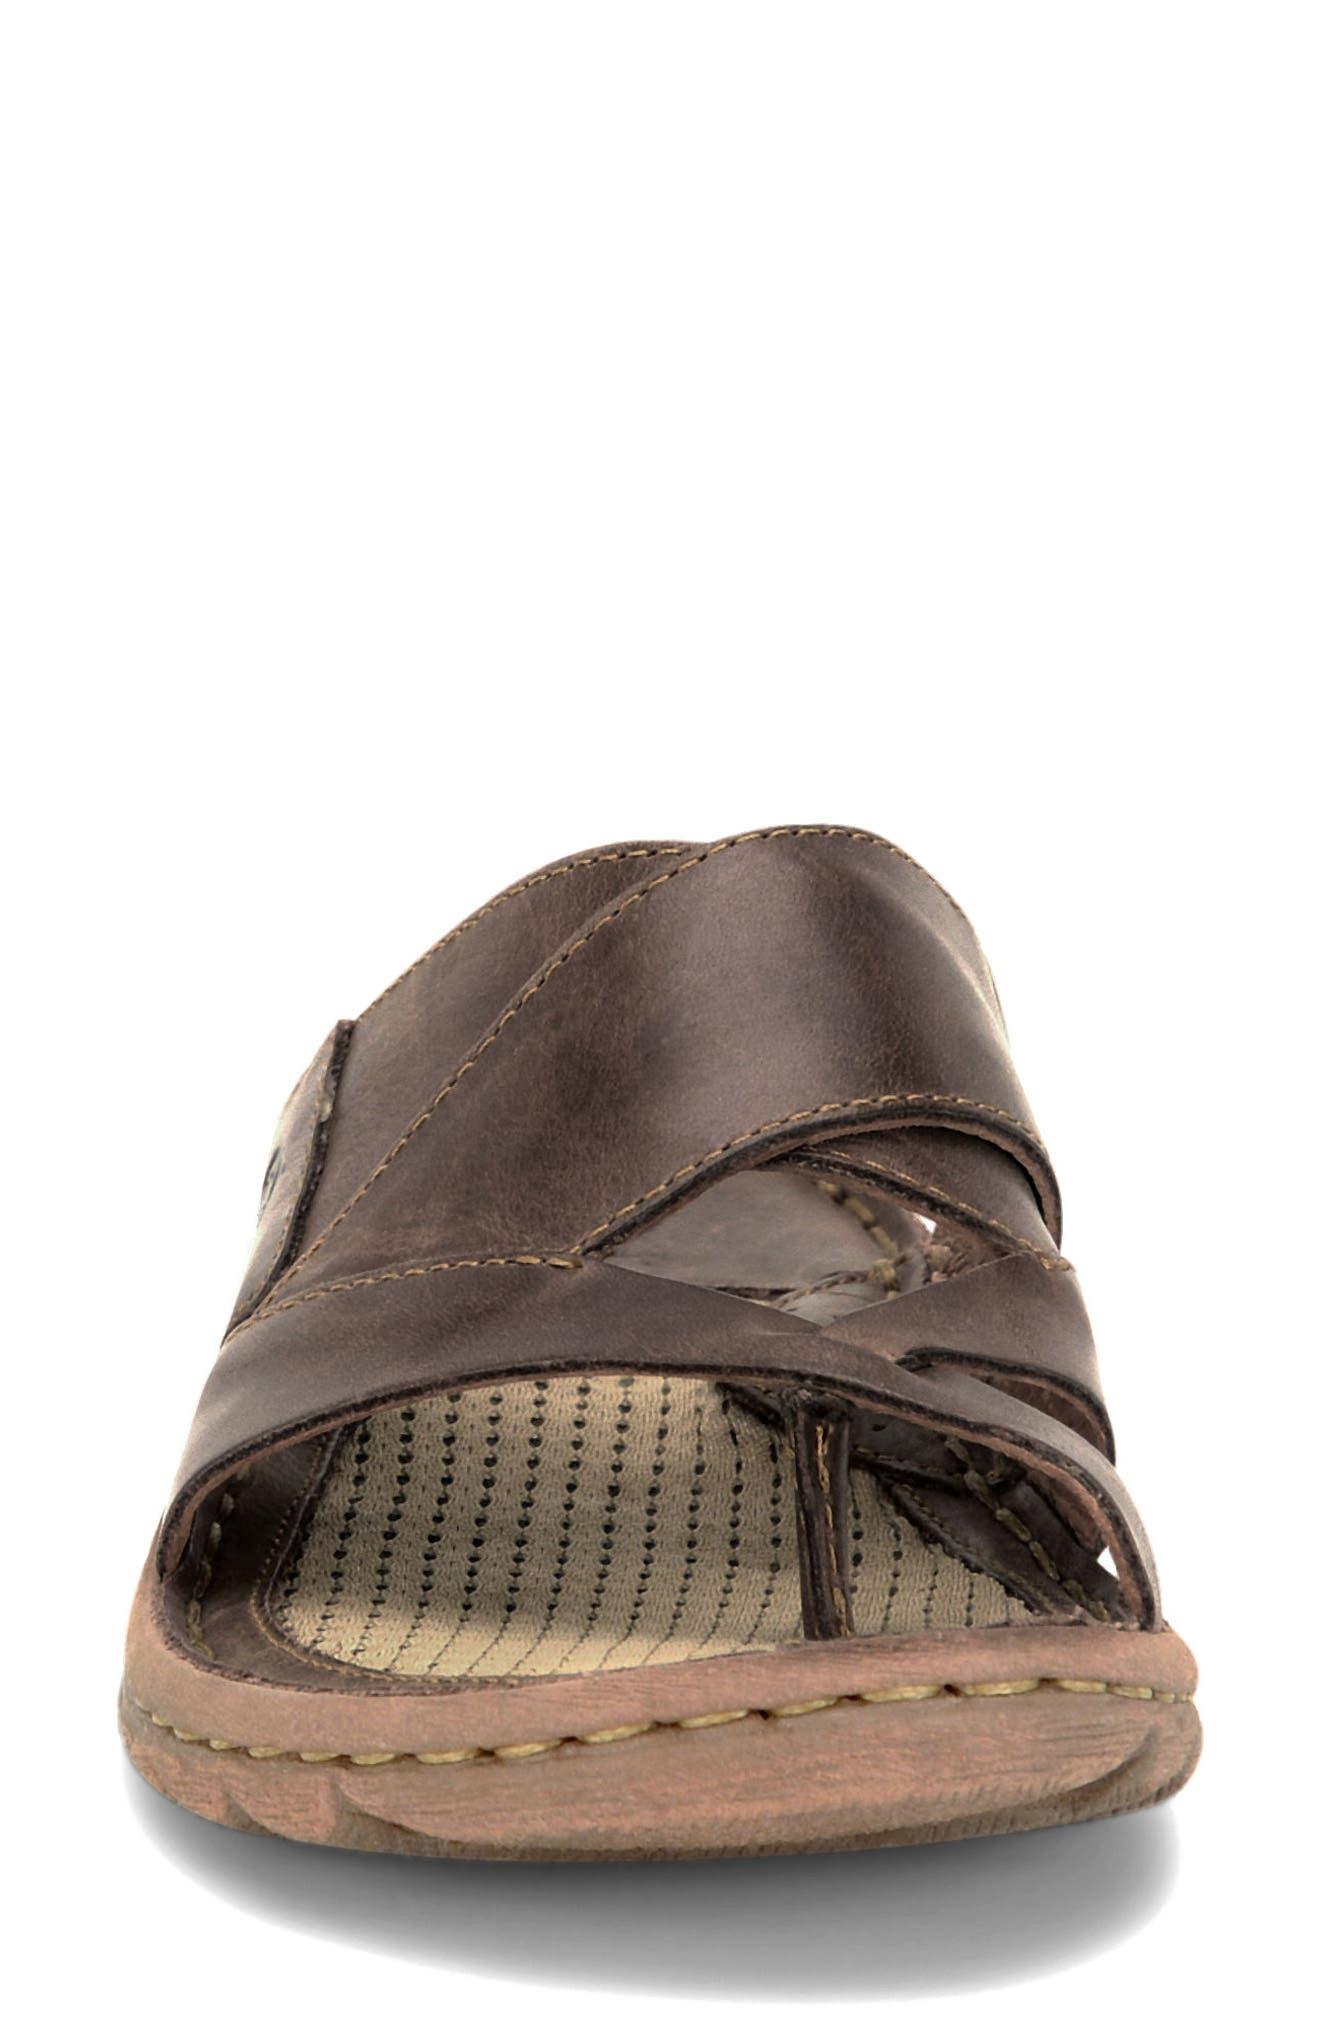 'Sorja' Leather Sandal,                             Alternate thumbnail 4, color,                             Dark Brown Leather